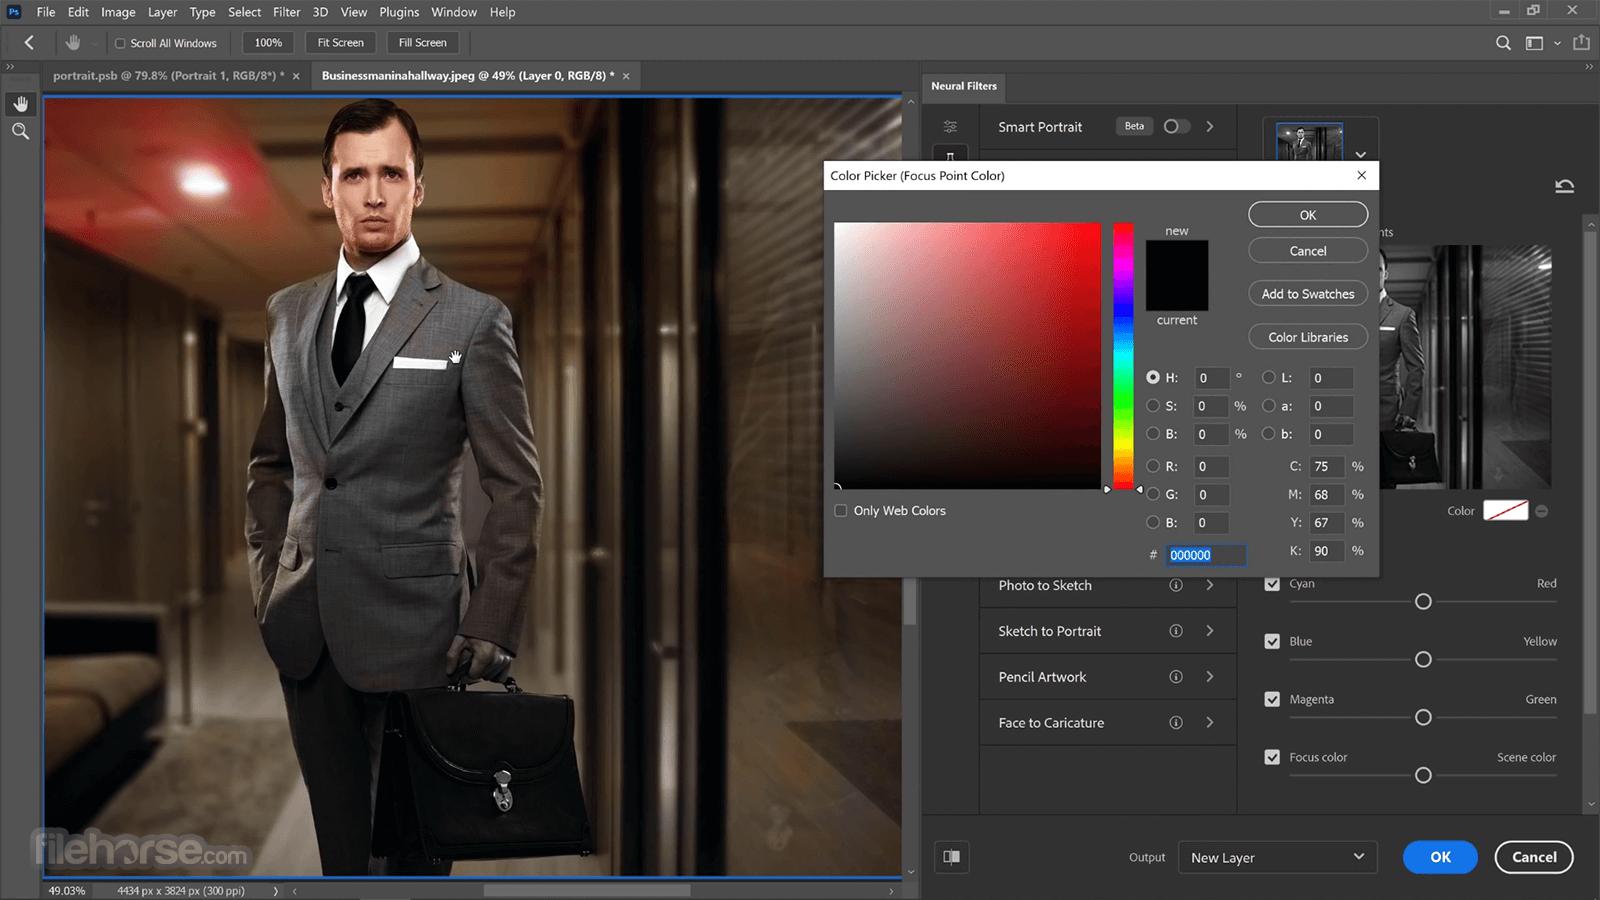 Adobe Photoshop CC 2021 22.3 (64-bit) Screenshot 3